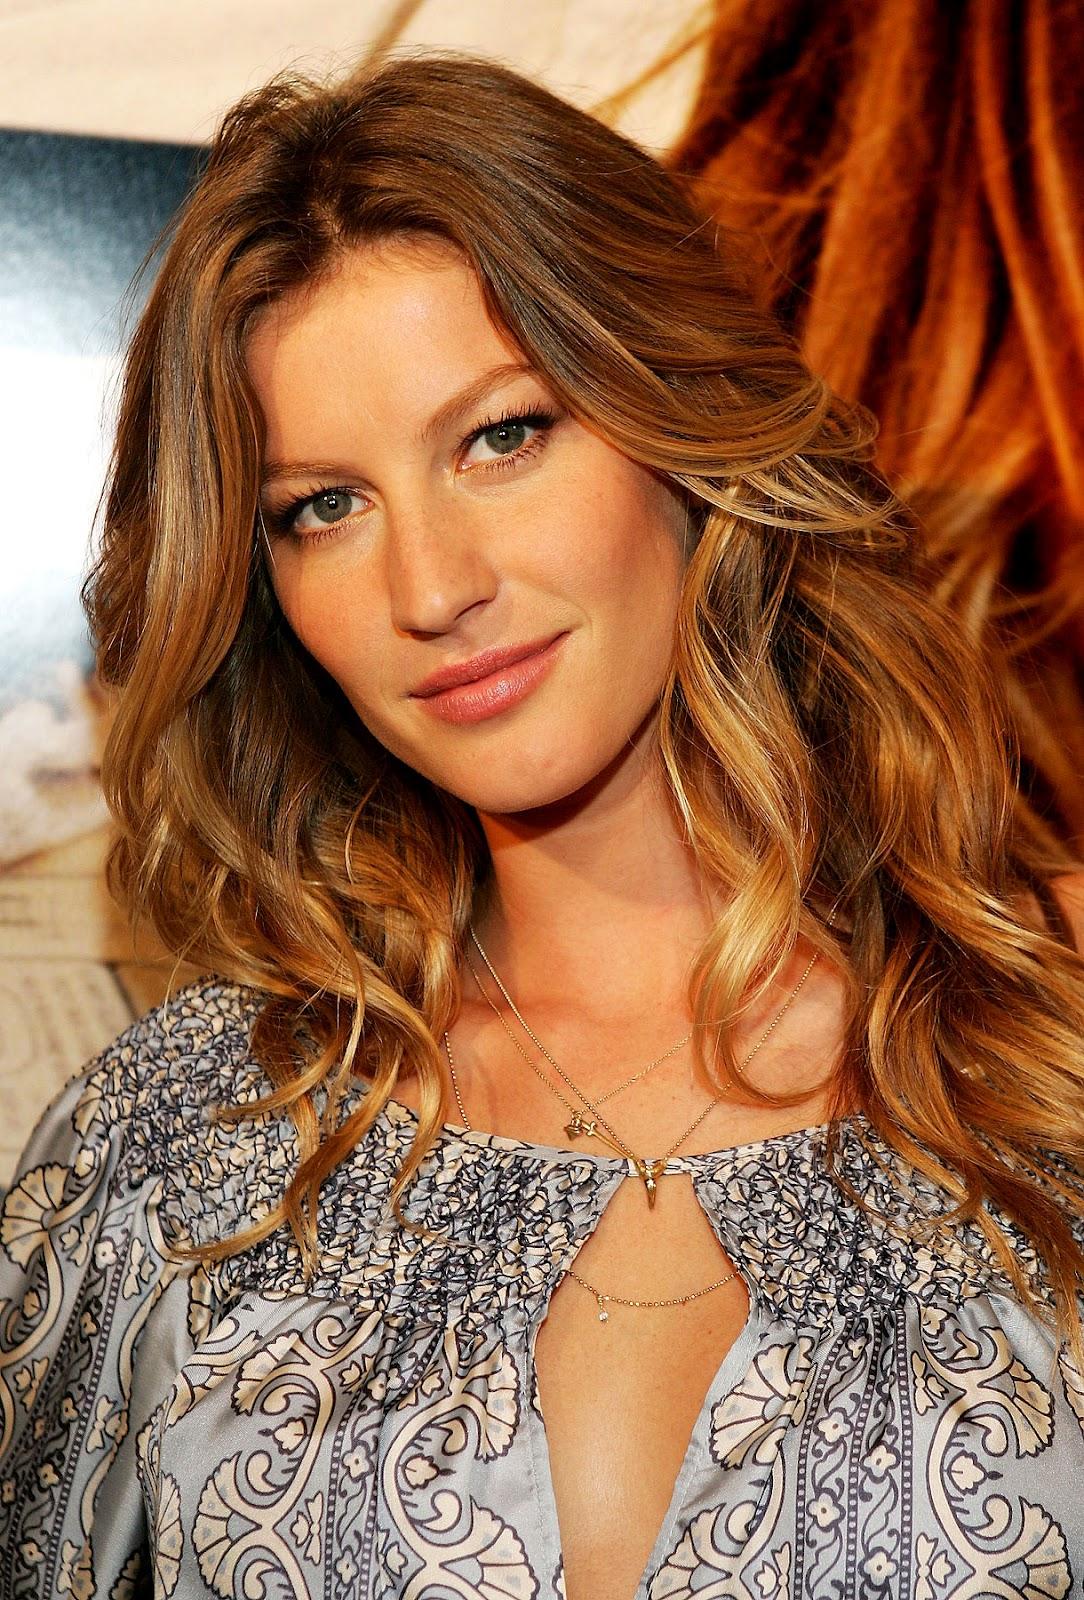 Gisele Bundchen Hot Brazilian Supermodel ~ Celebrity Hot Blog Gisele Bundchen